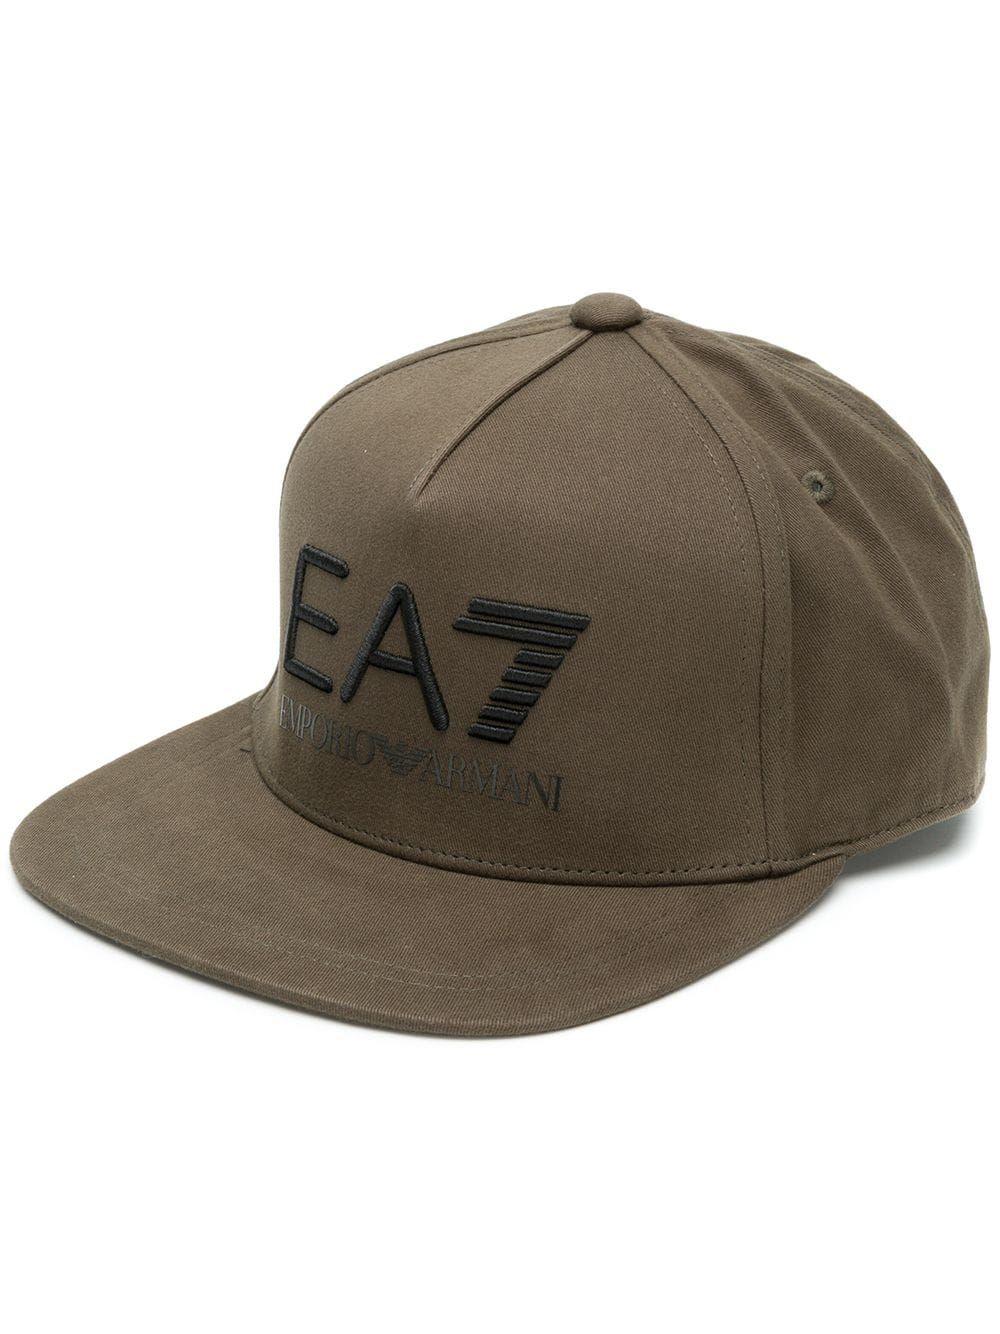 EA7 EMPORIO ARMANI EA7 EMPORIO ARMANI CONTRAST LOGO BASEBALL CAP - GREEN.   ea7emporioarmani 73368a54d117